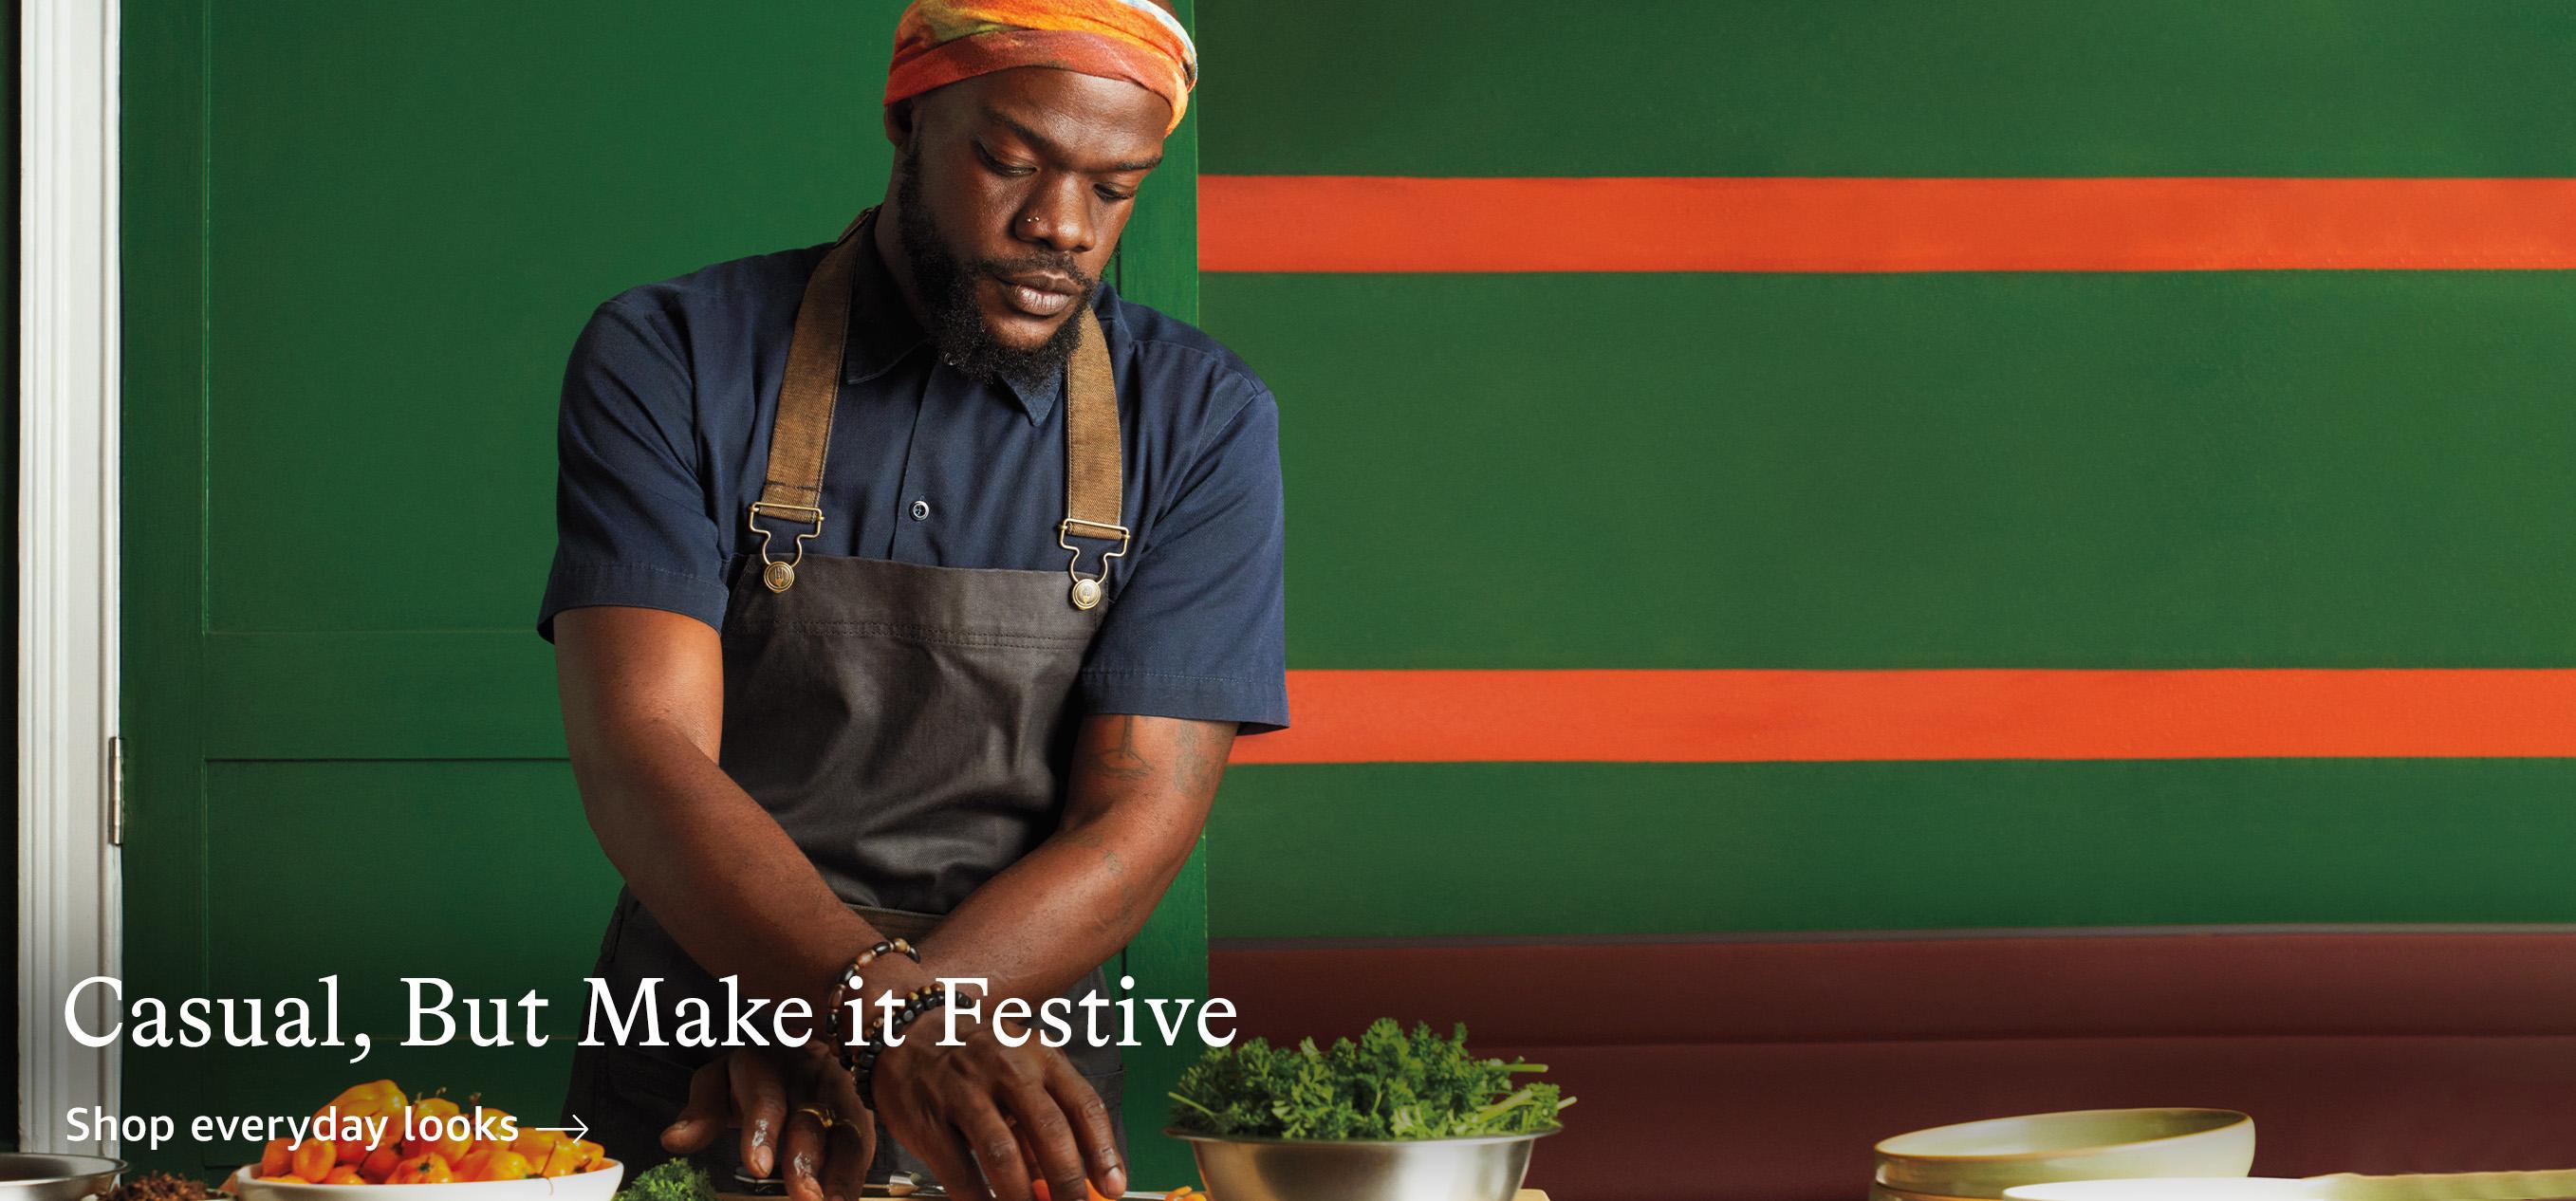 Casual, But Make it Festive